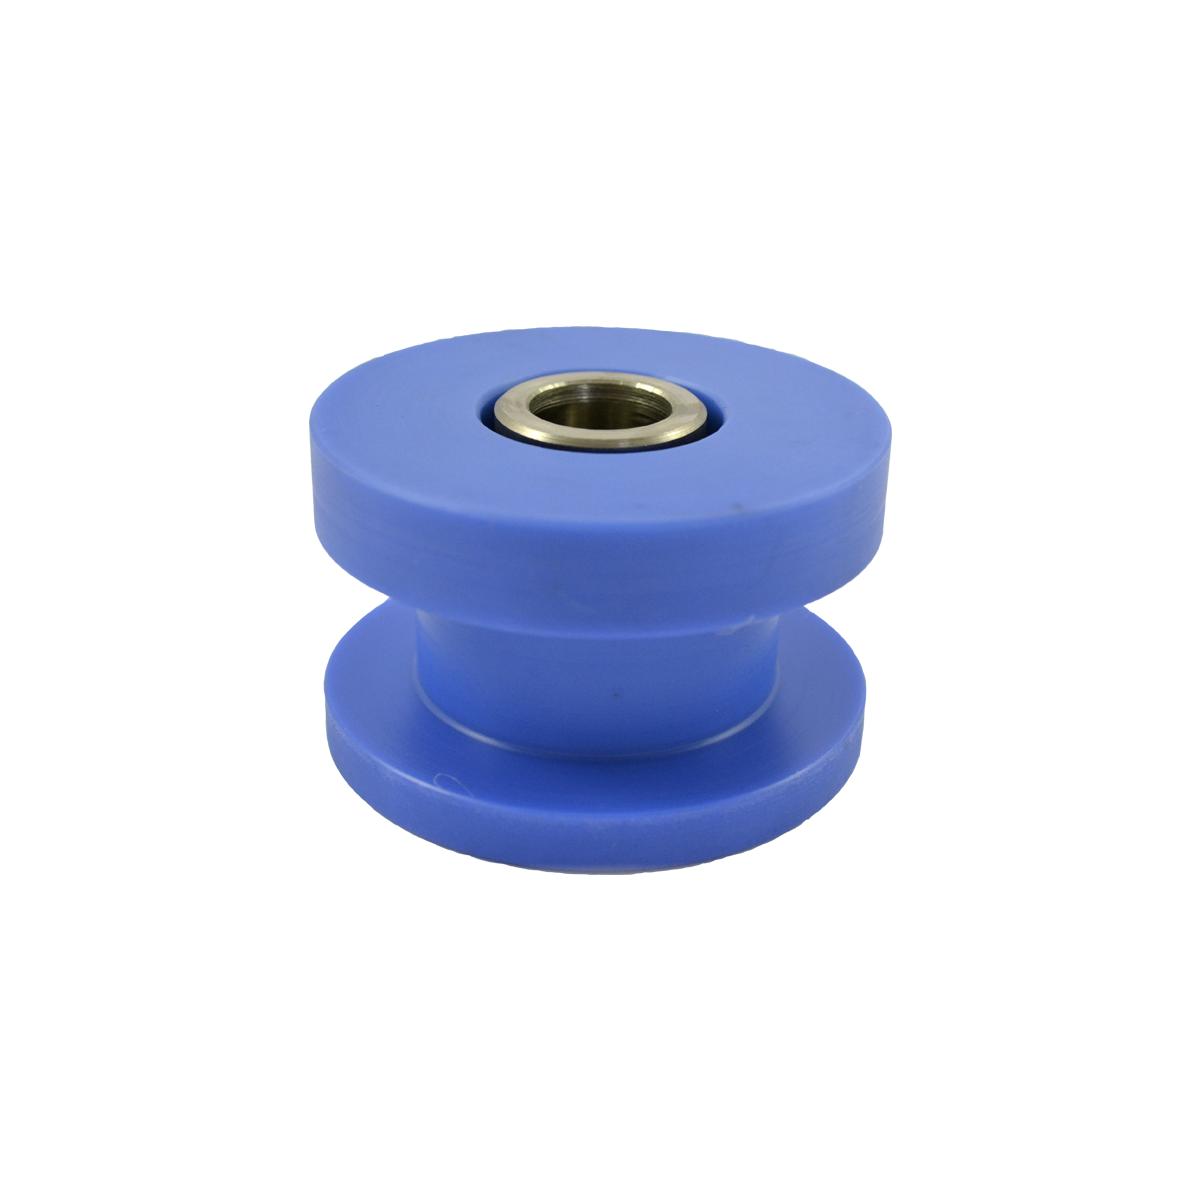 090-007-327ASM Roller Bearing Assembly